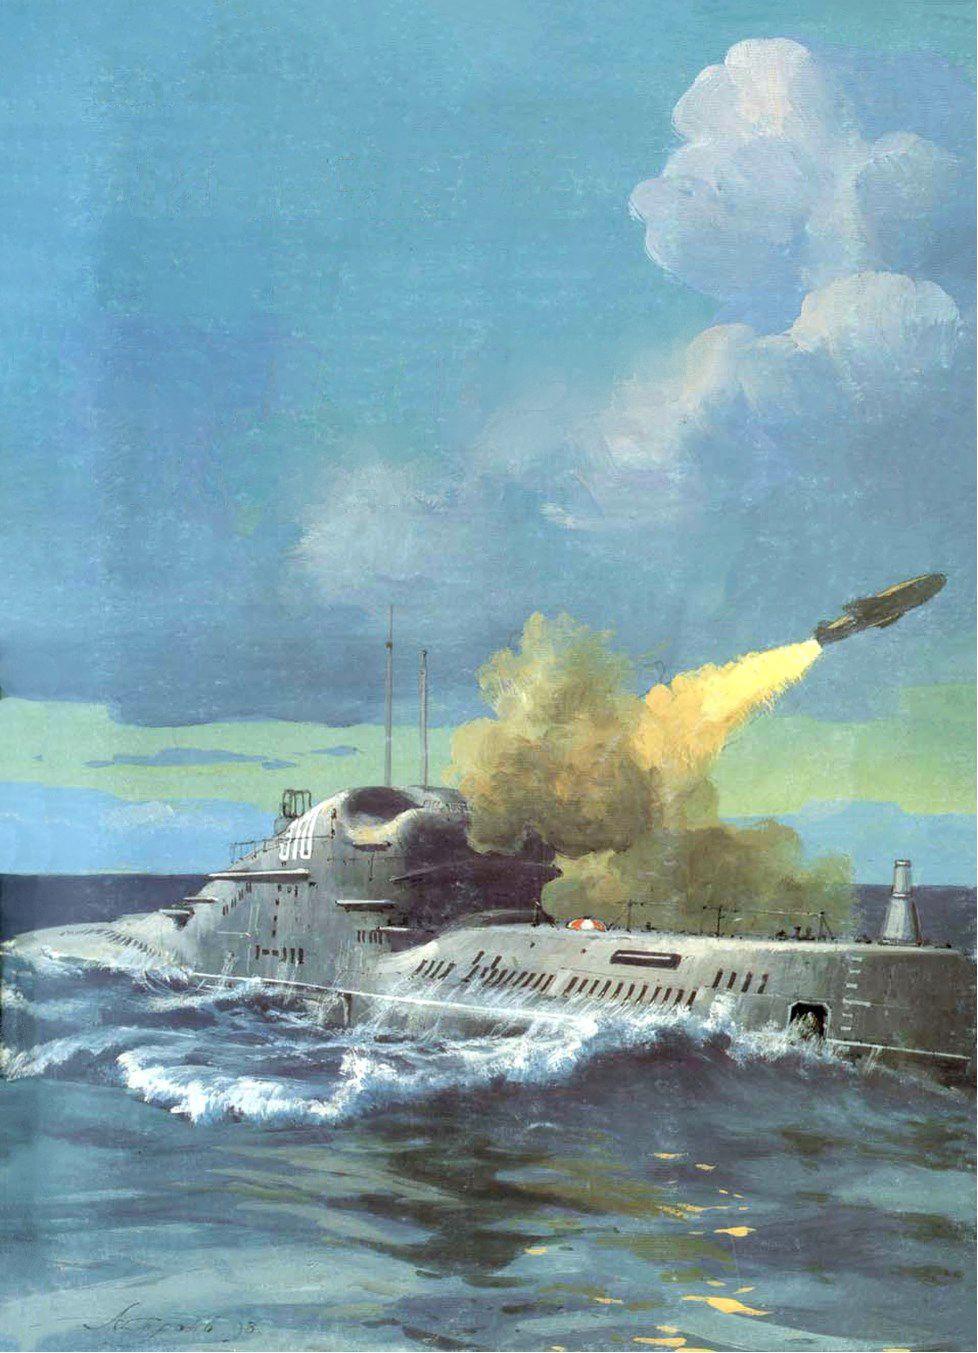 German submarine U-665